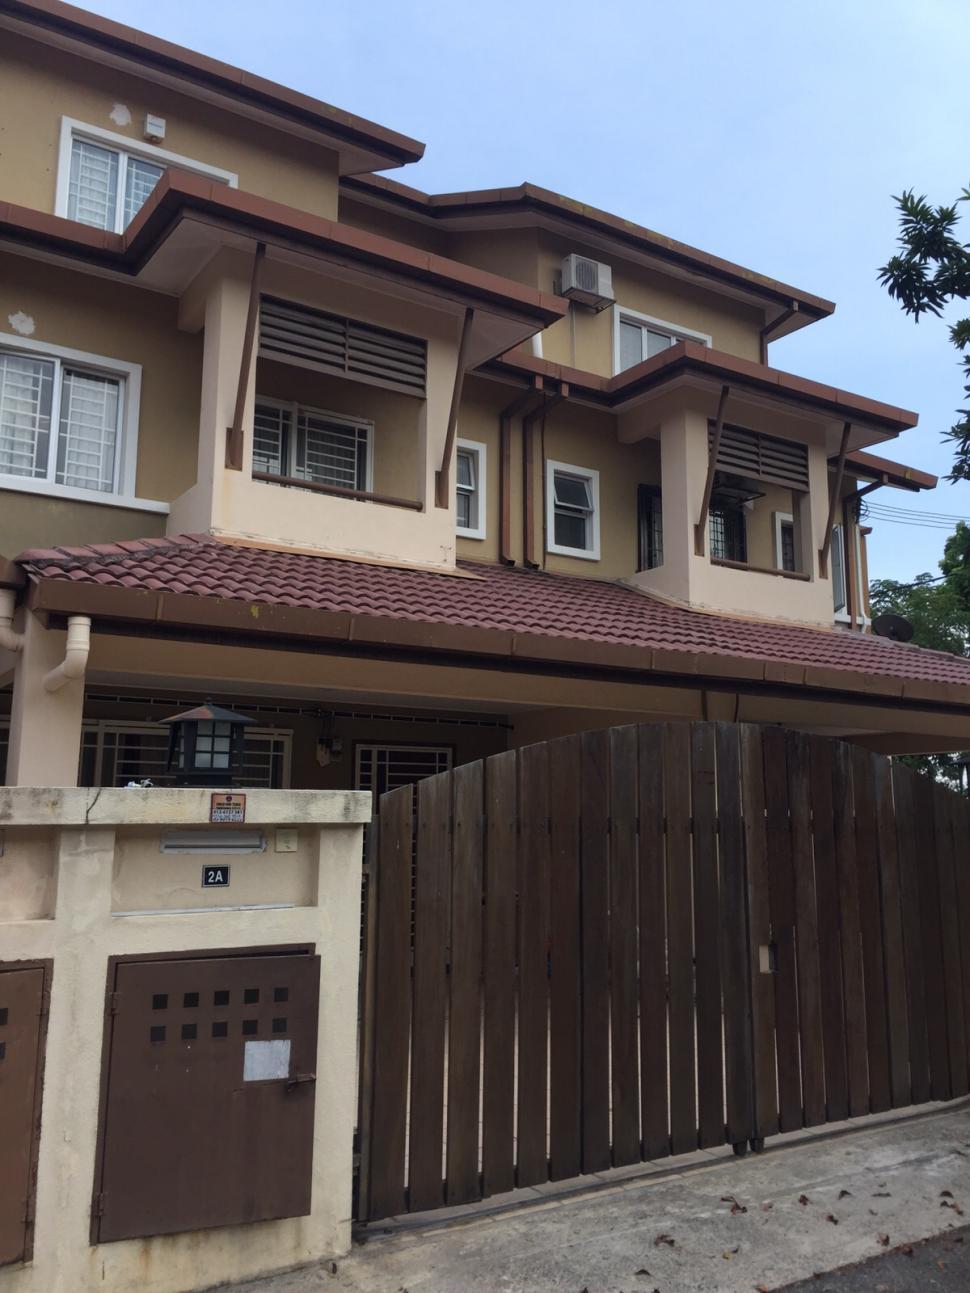 2.5 Storey House, Jalan Inang, Bandar Makhota Cheras